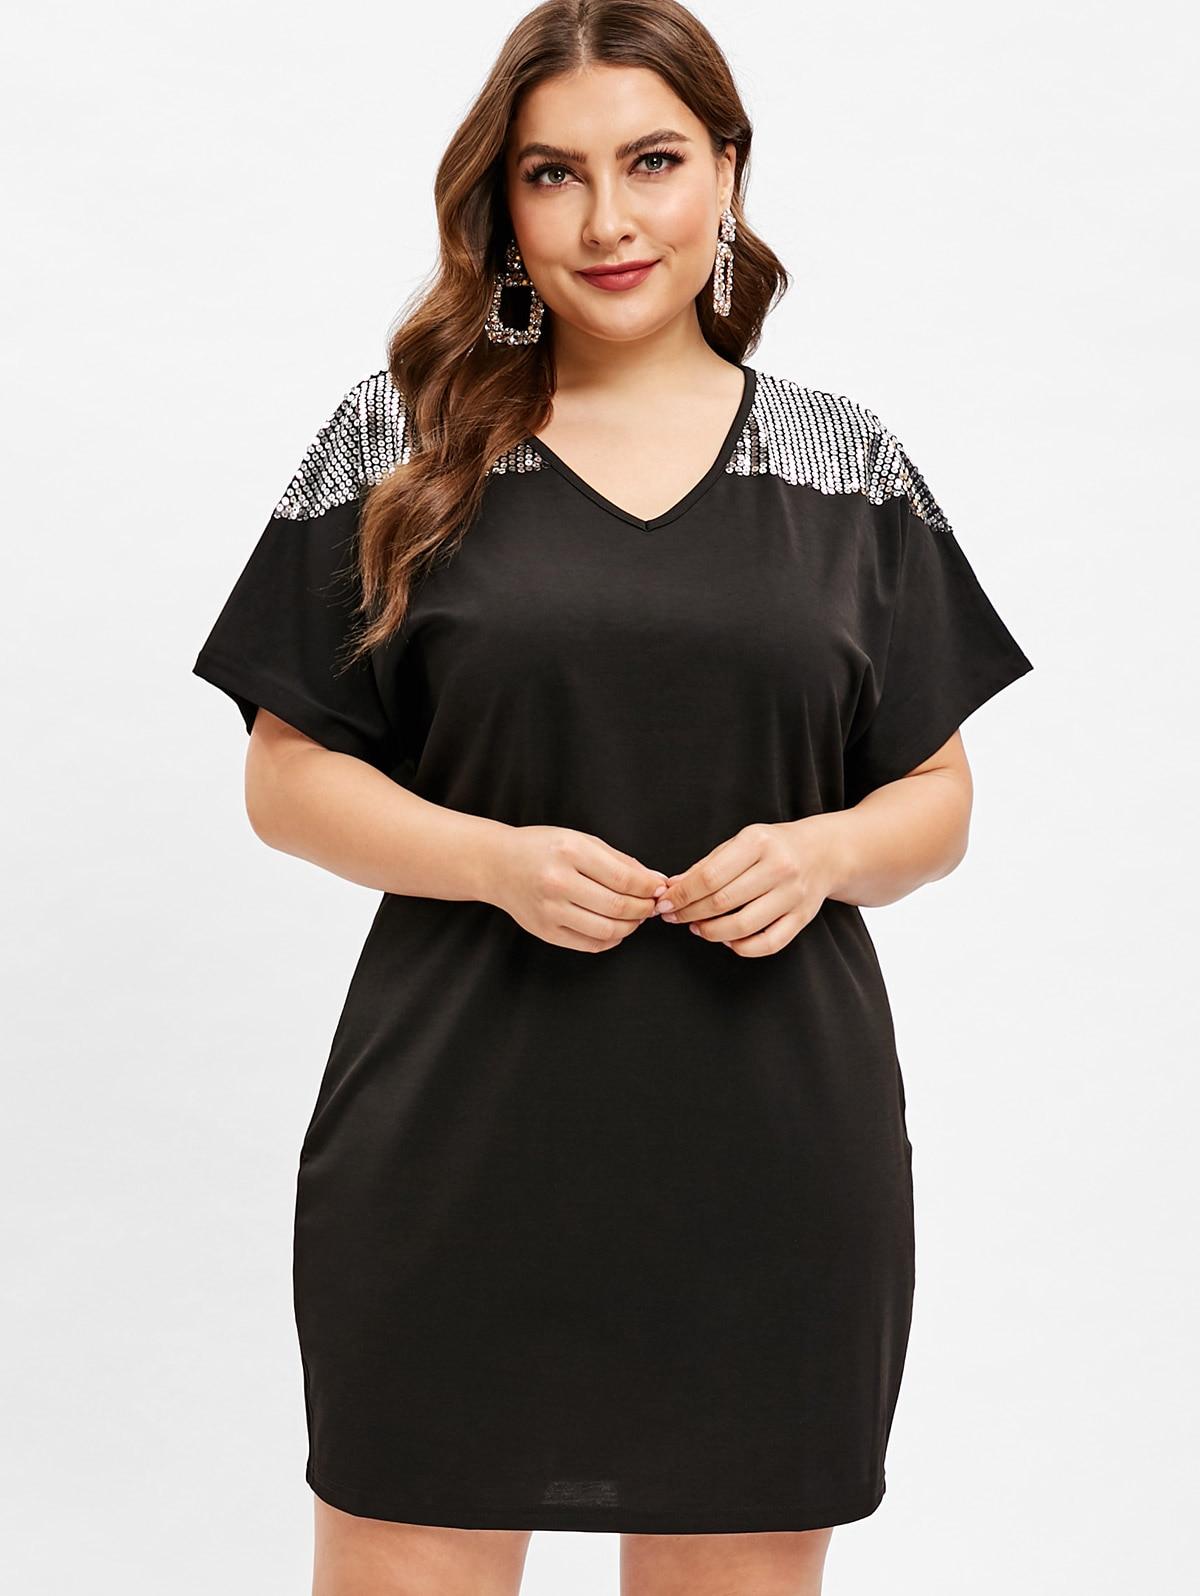 Wipalo Plus Size Short Sleeves Sequin Embellished Shift Dress Solid Black  Party Vestidos Retro Vintage Dress d620e775005e